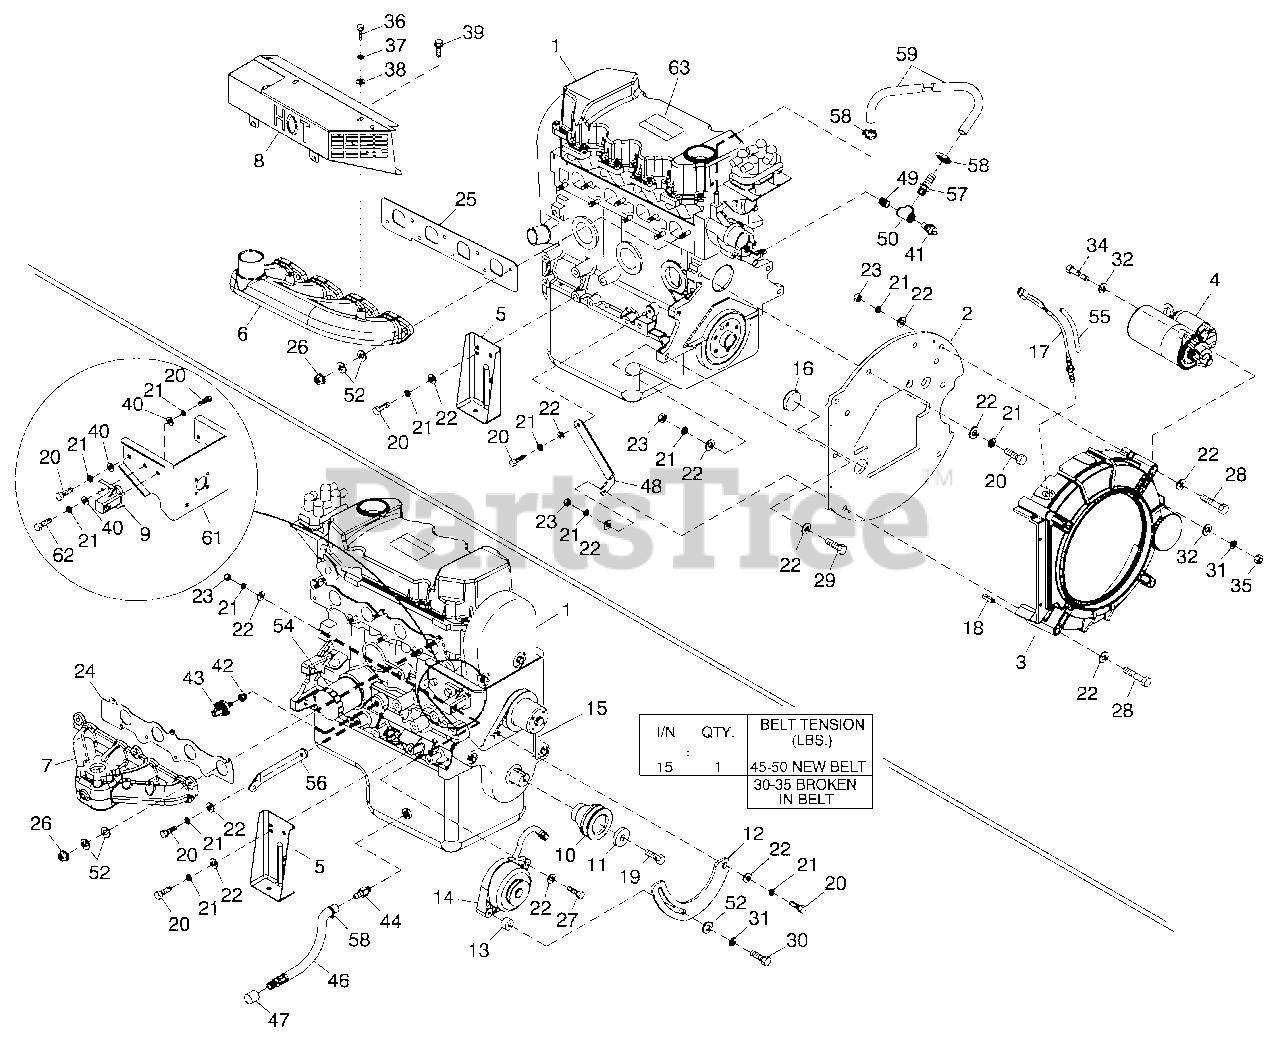 Generac Ct02016gnsn - Generac 20kw Home Standby Generator  Sn  2407v24227